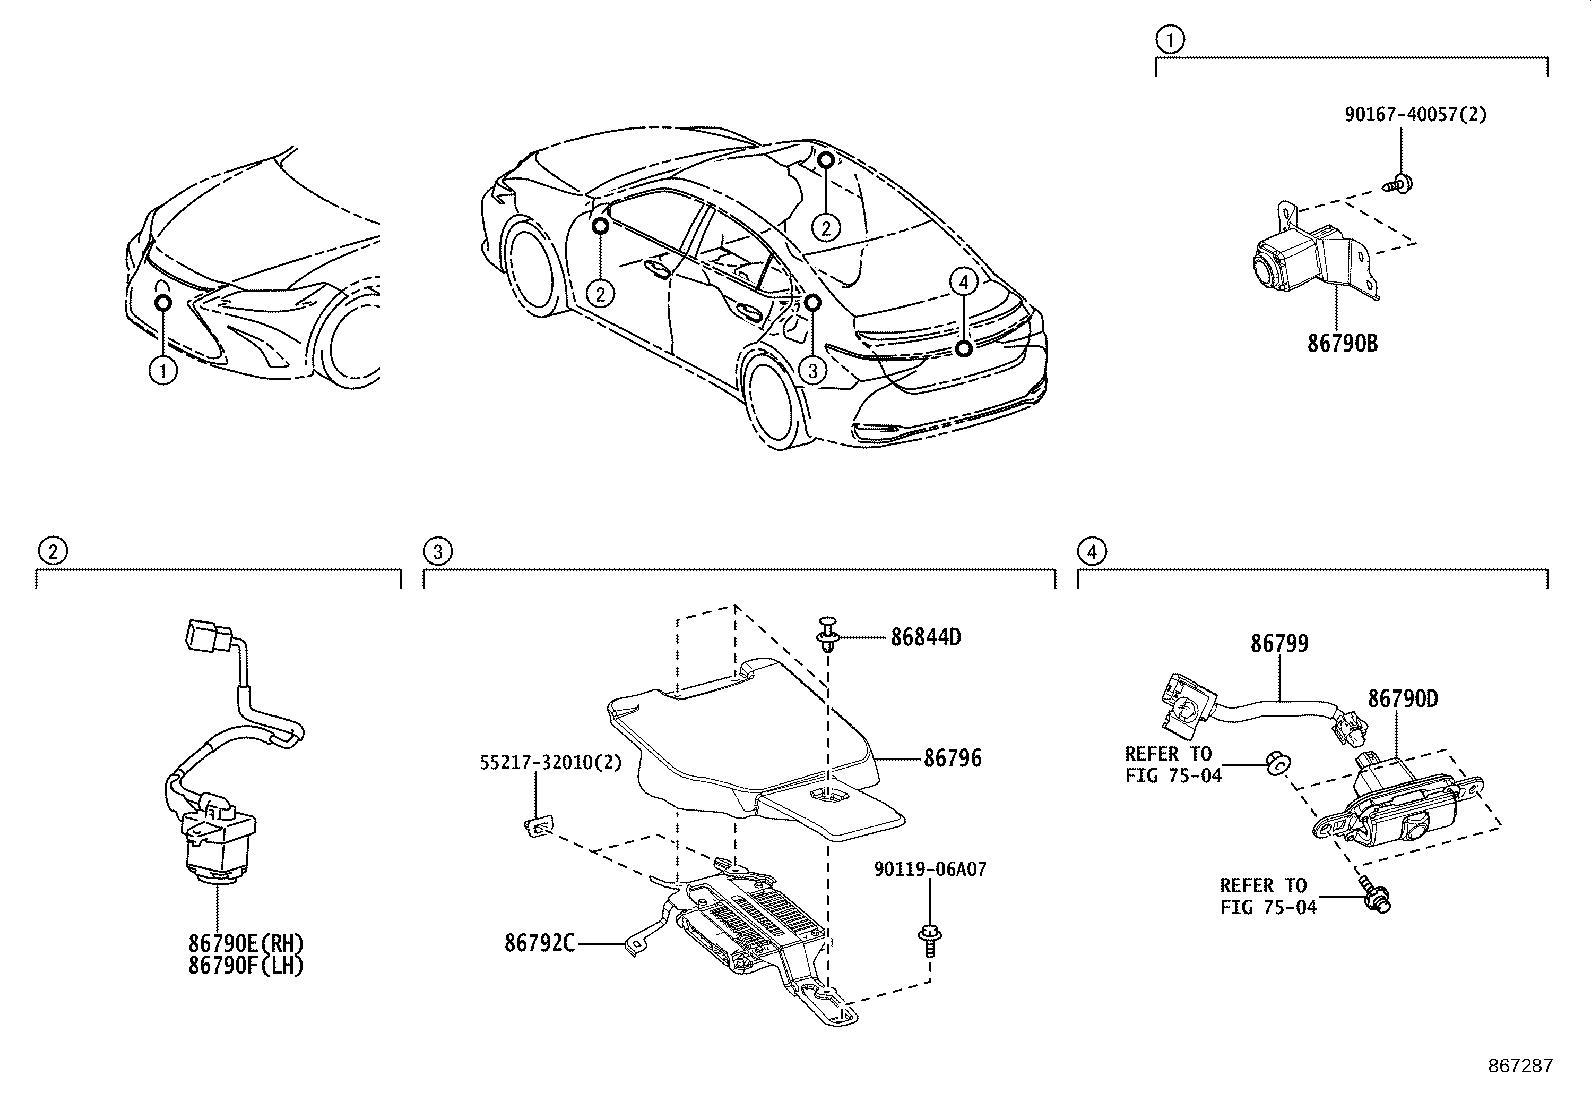 Lexus Es 350 Computer Parking Assist Monitor Back